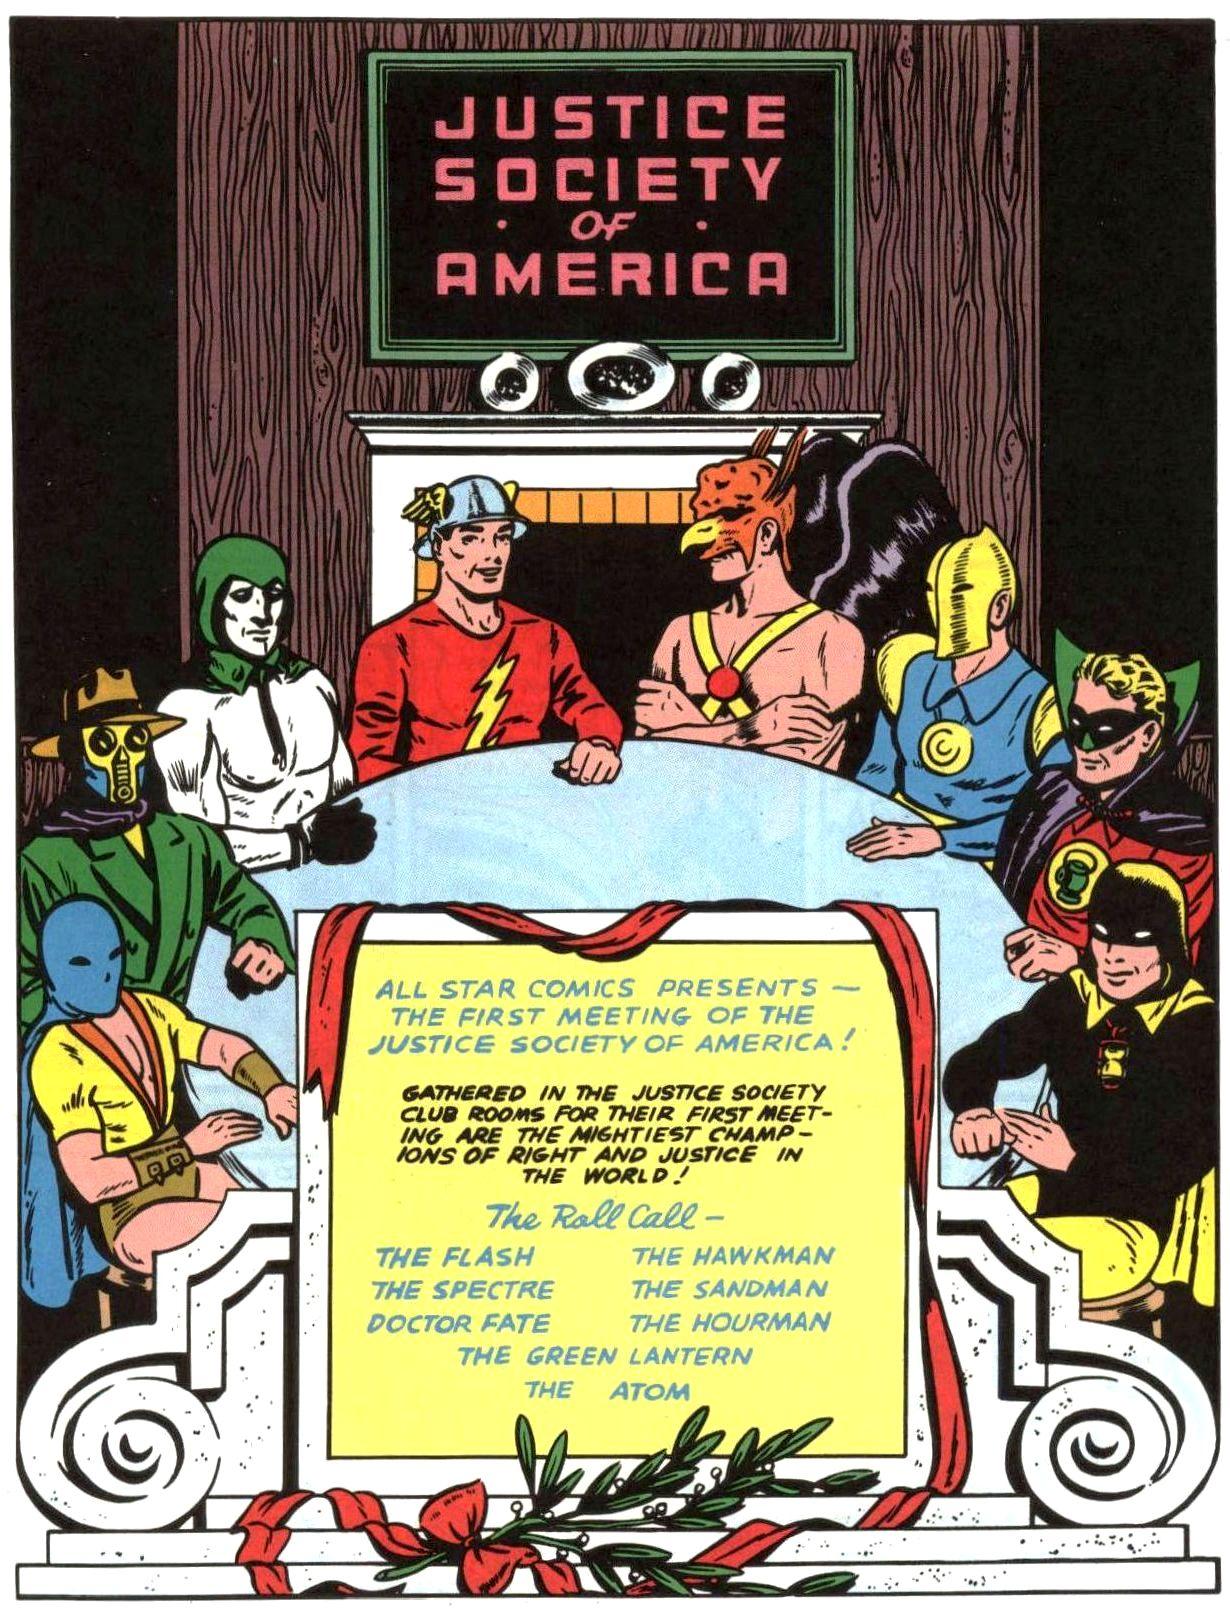 All Star Comics 3